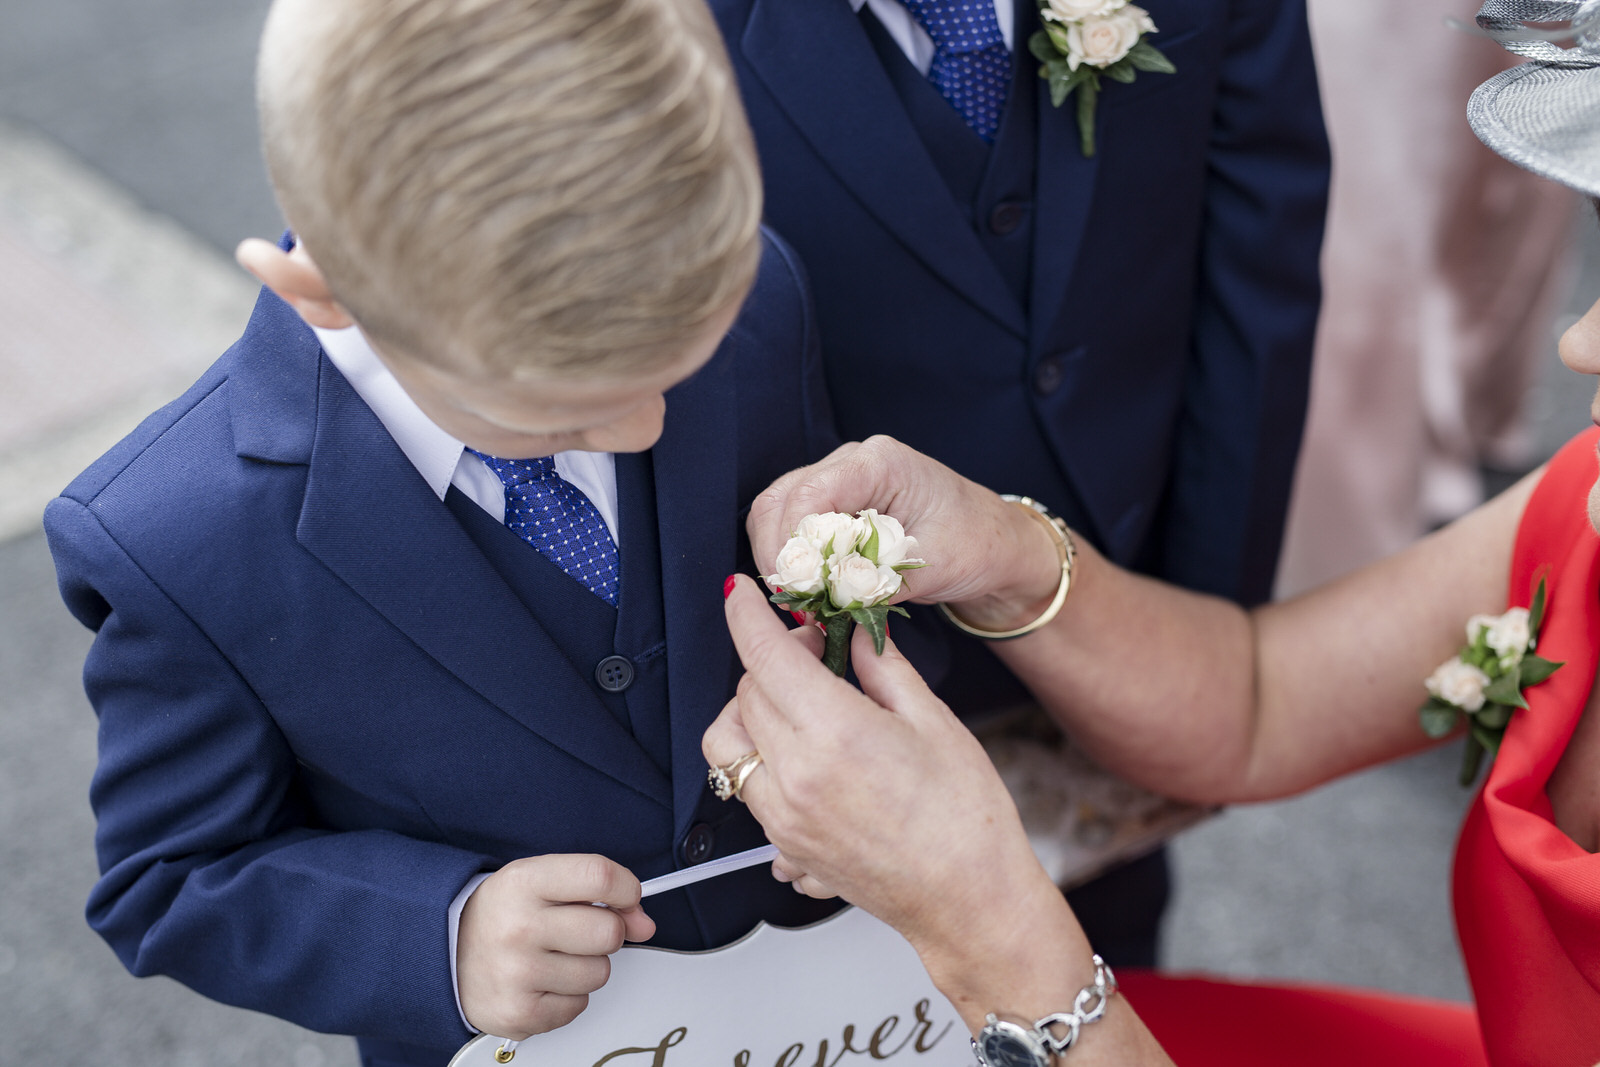 waterford_faithlegg_wedding_photographer_goldenmonentsweddingphotography_a532.jpg